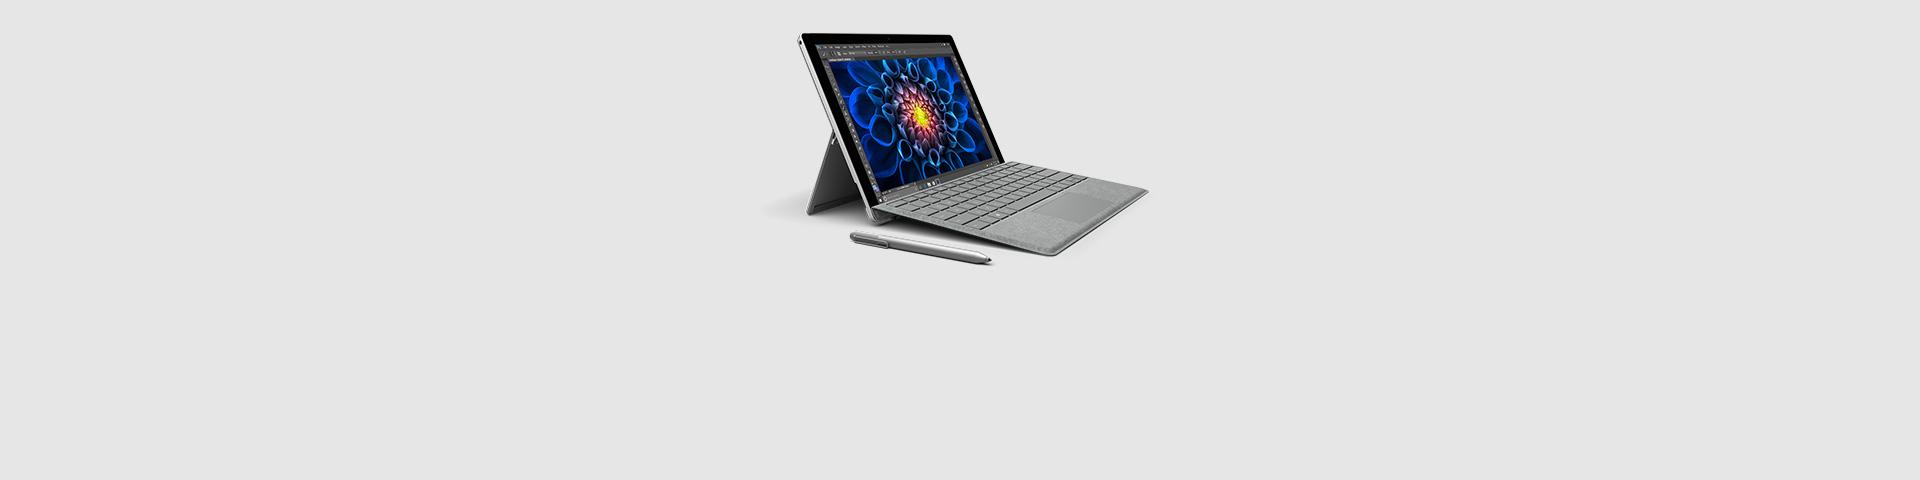 A Surface Pro 4 device